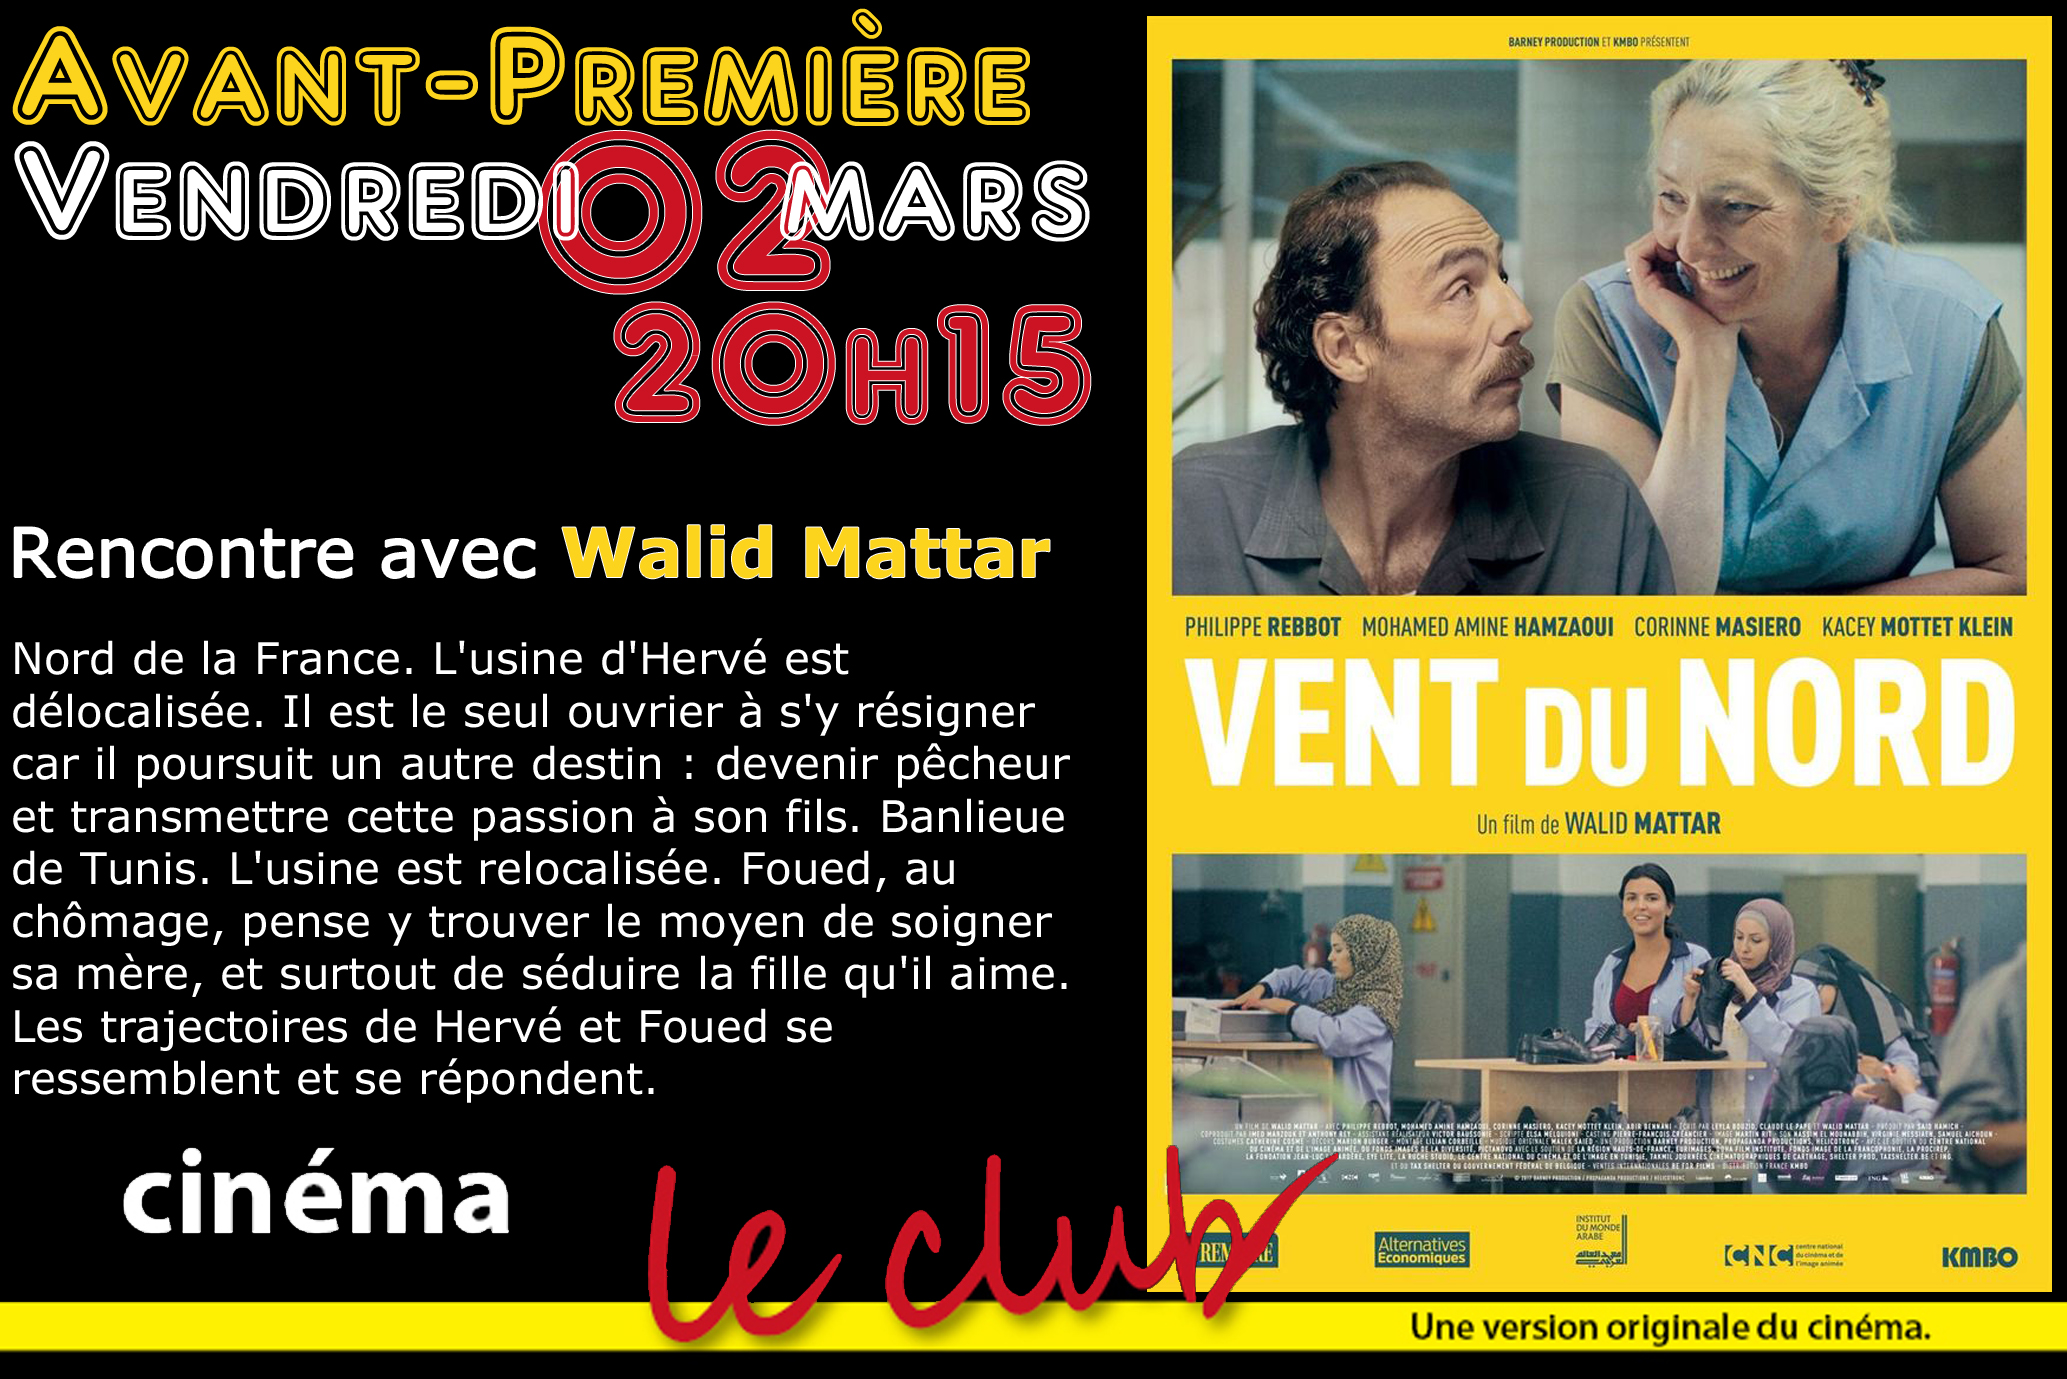 Locaux: Matériel, Fournitures Initiative Coffret U.s Bleu Marine Senior Chef Rouge E-8 Journaliste Jo